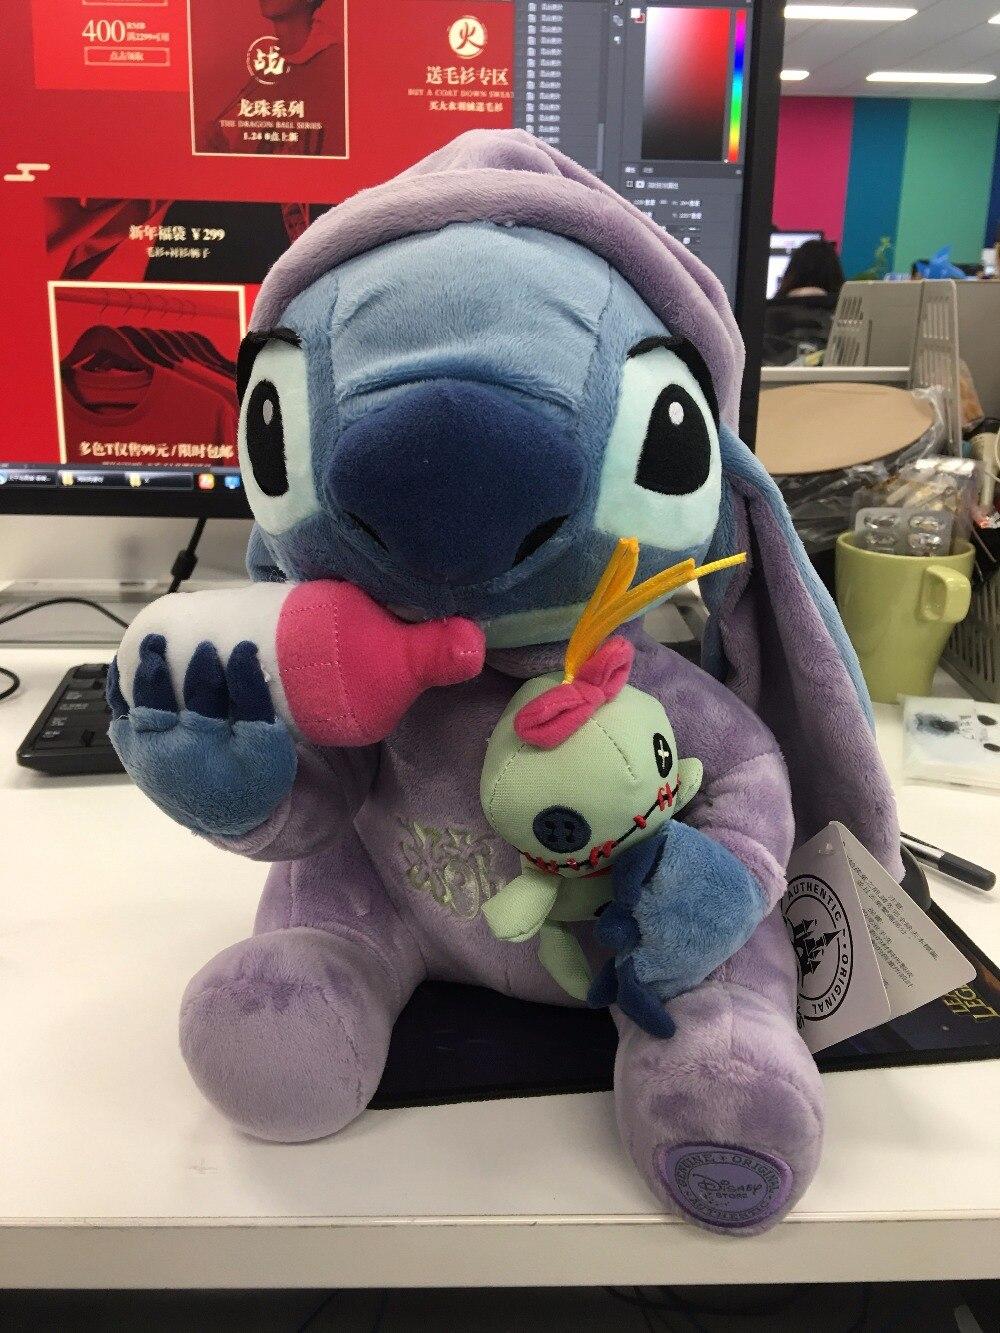 Disney Lilo and Stitch Stitch in Pajamas Holding Scrump Milk Bottle Ohana Plush